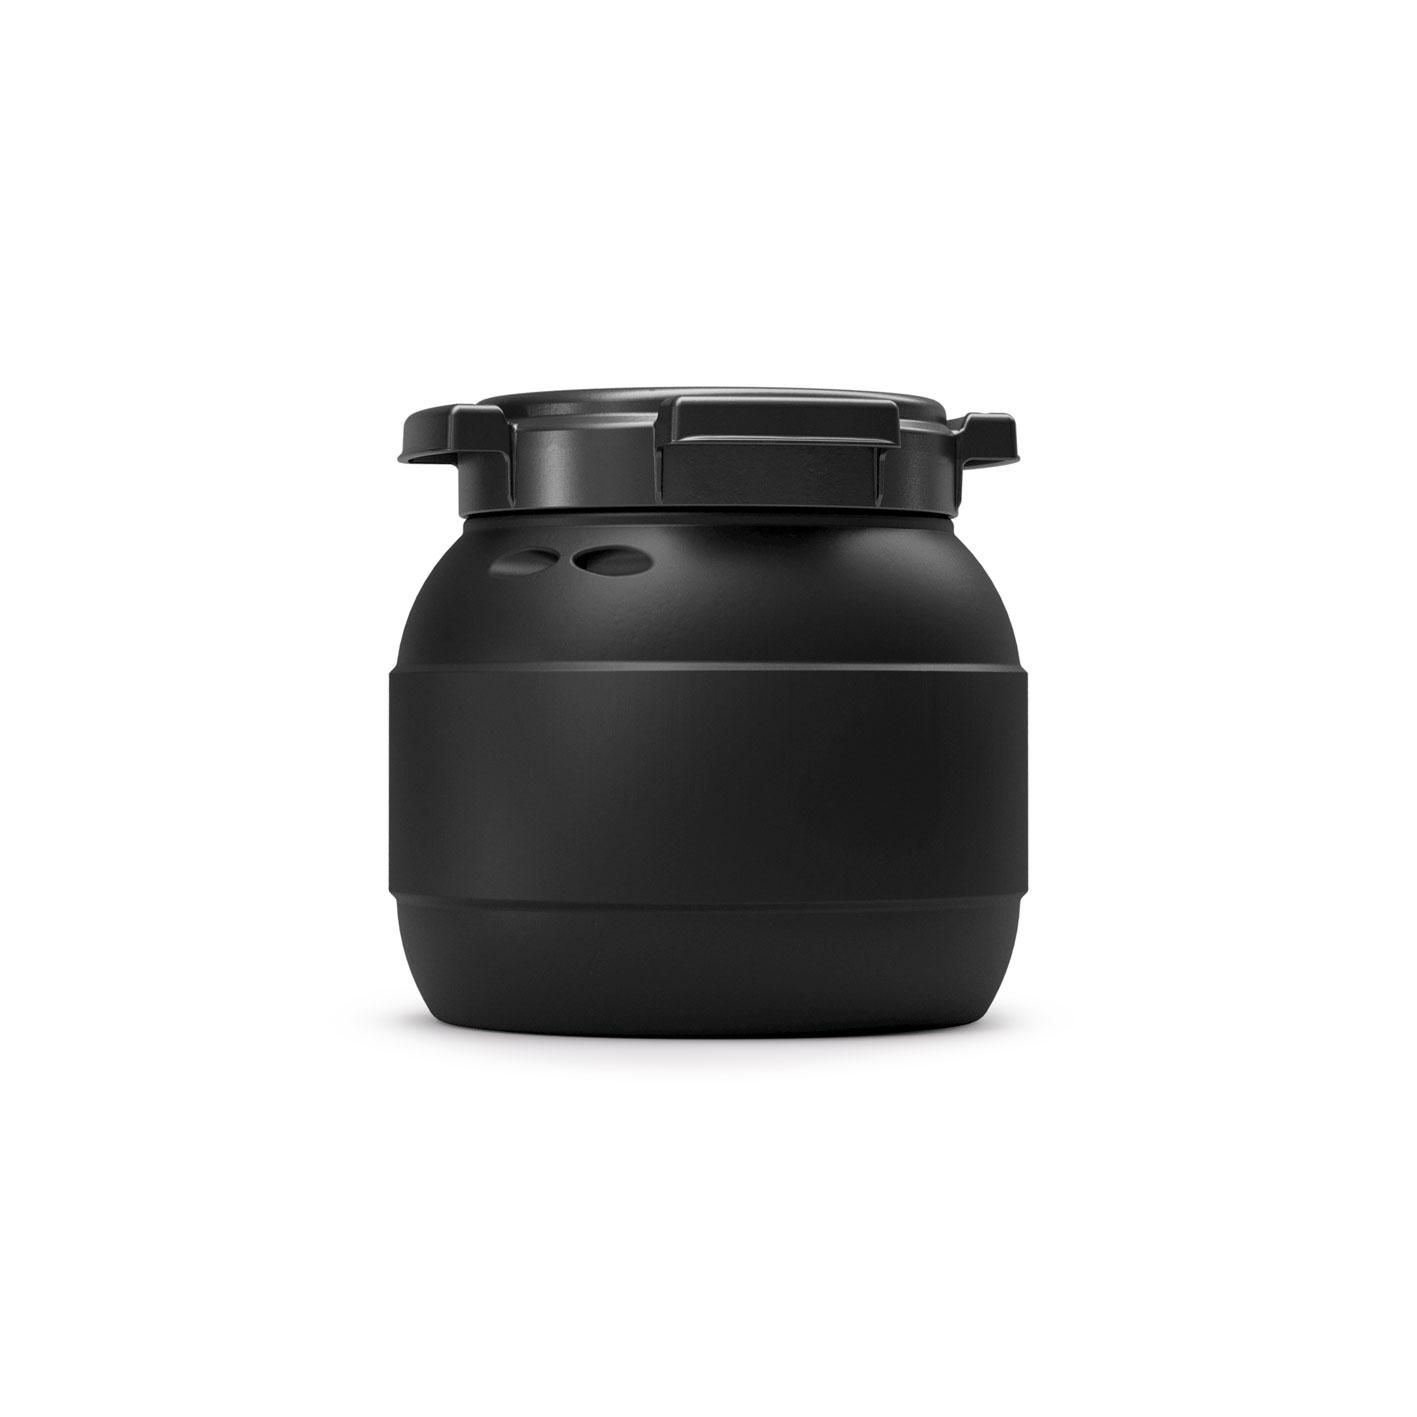 3.6 liter Conductive drum